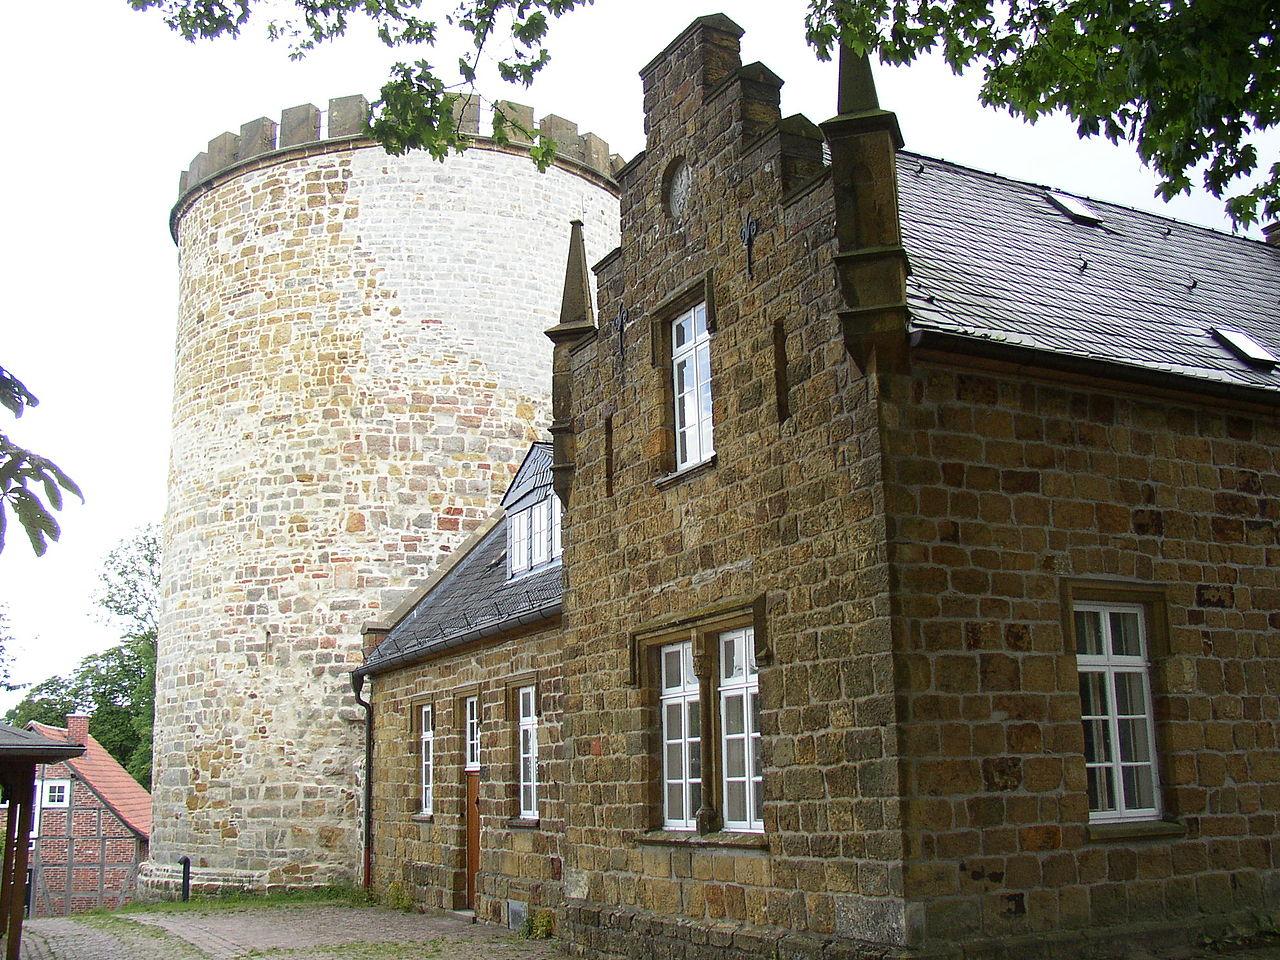 Bild Burg Ravensberg Borgholzhausen